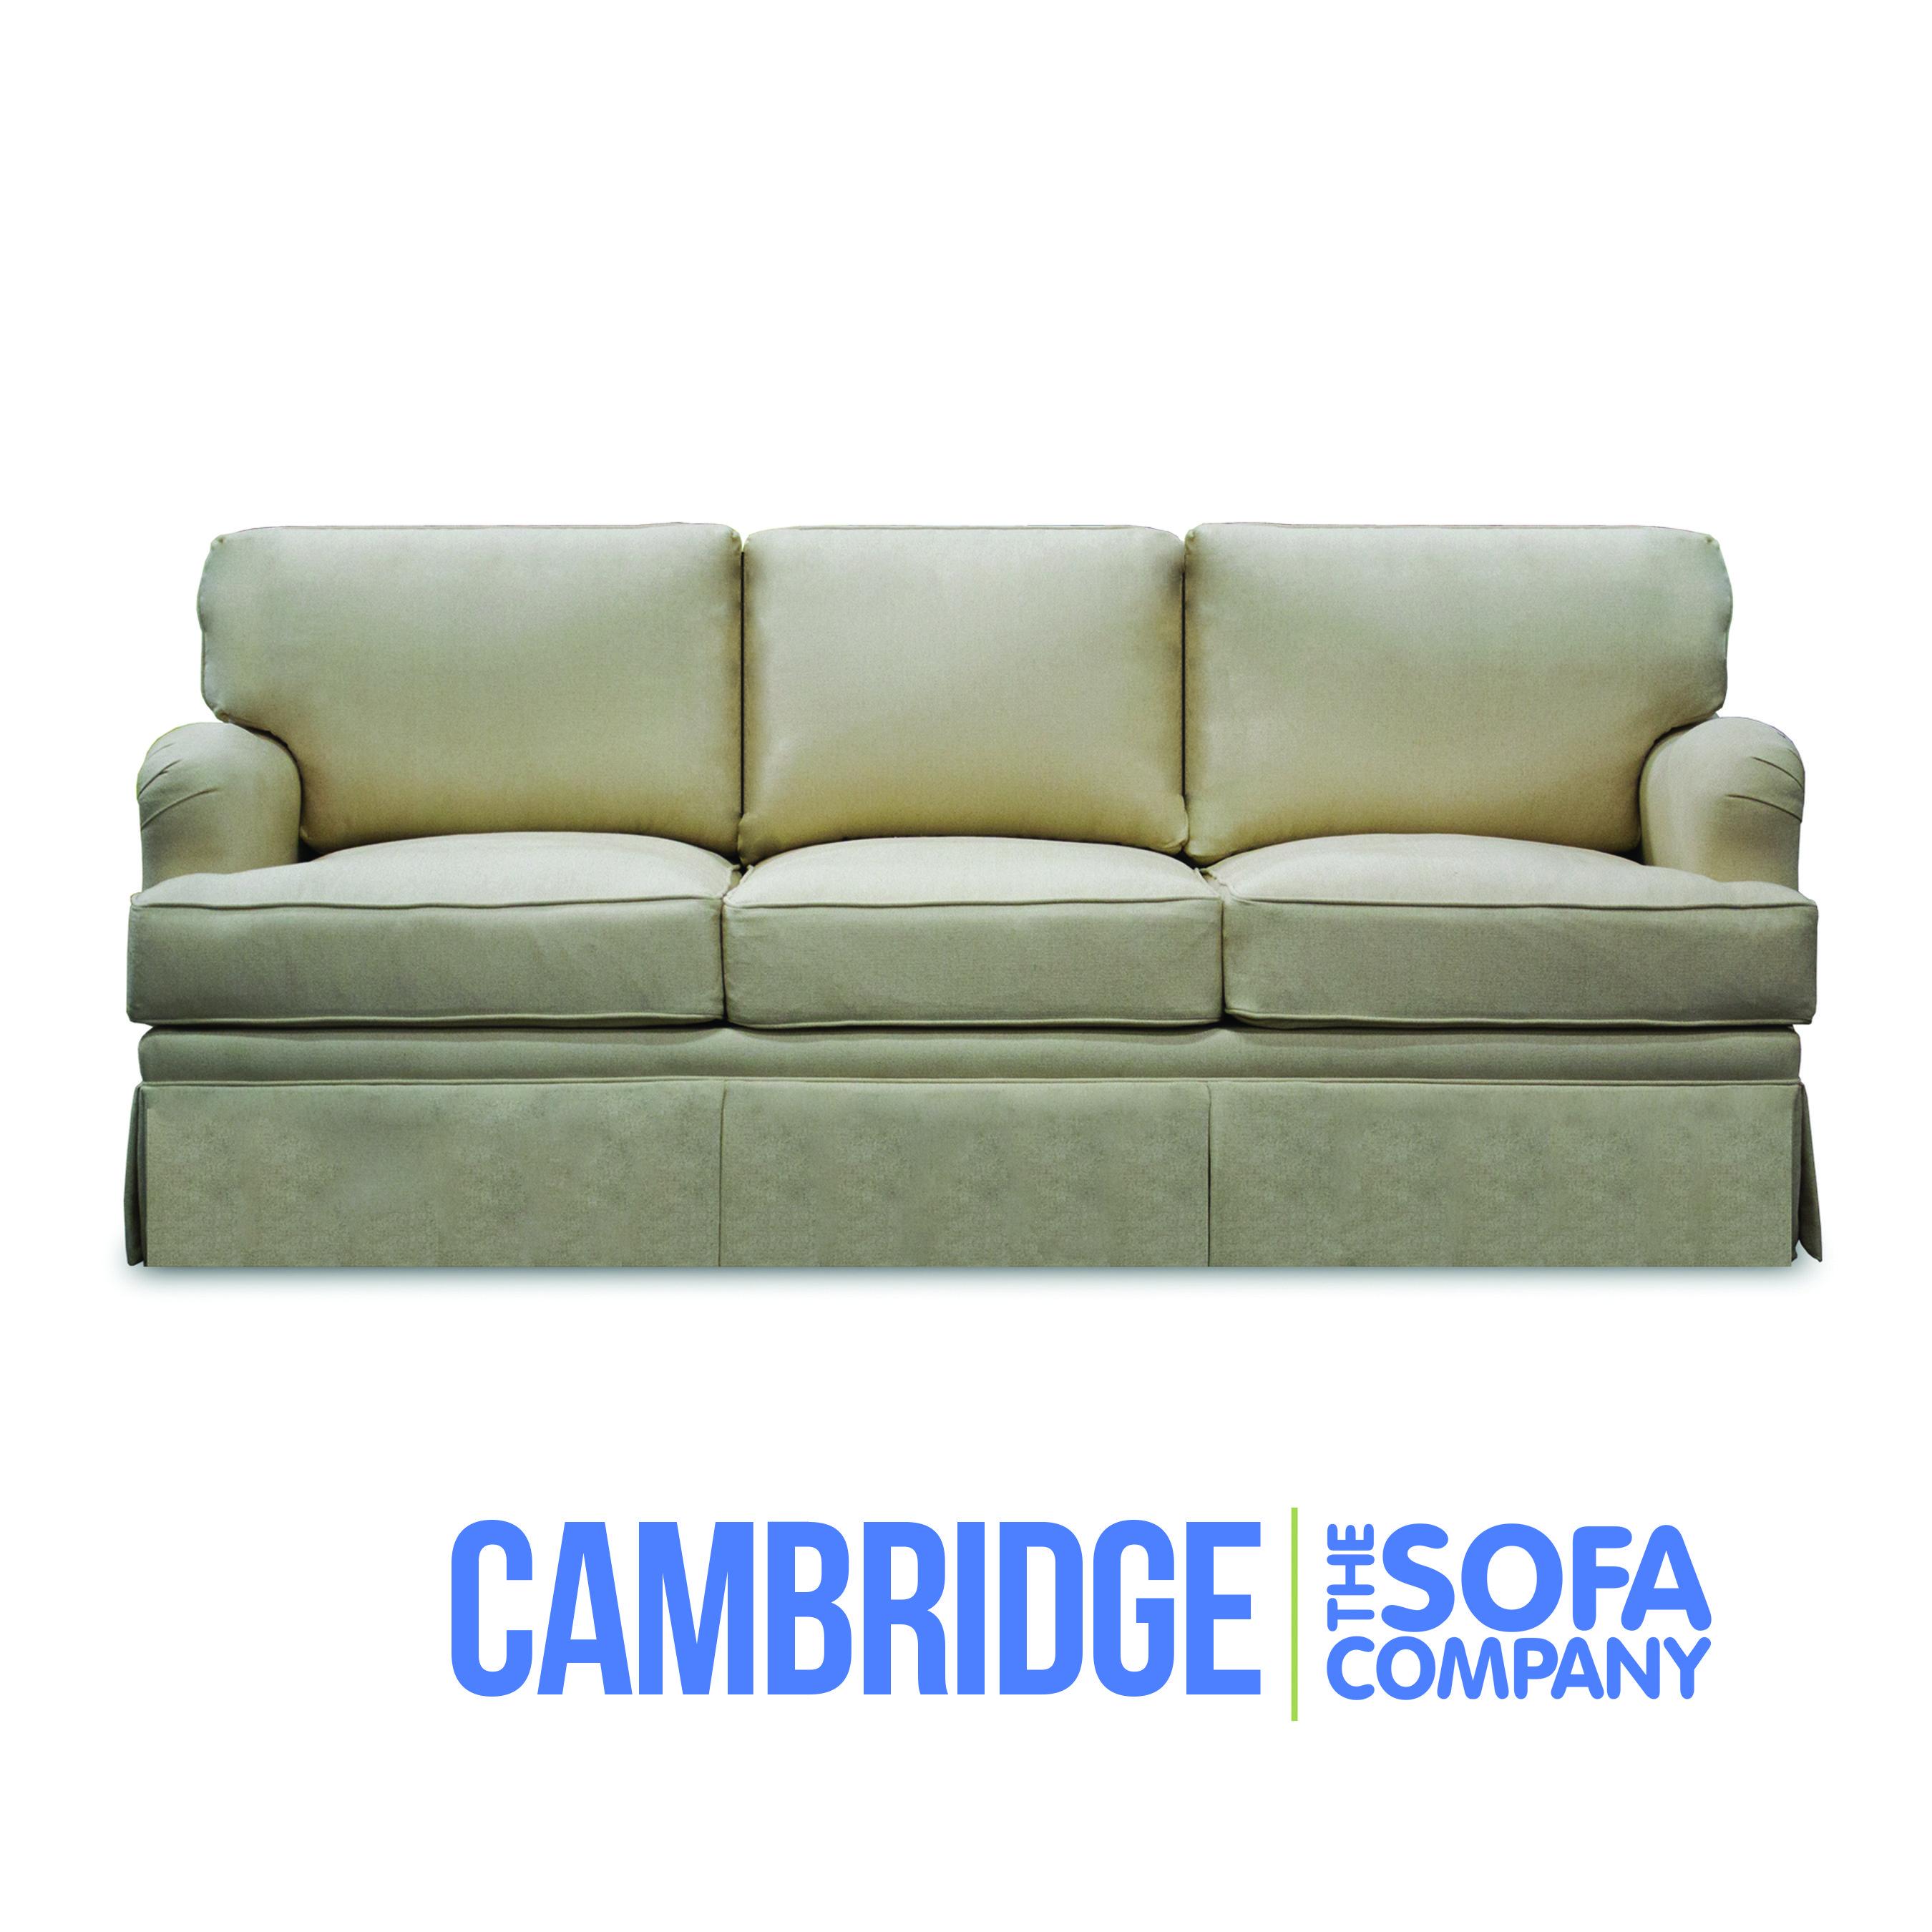 Merveilleux Cambridge Style By The Sofa Company Www.thesofaco.com